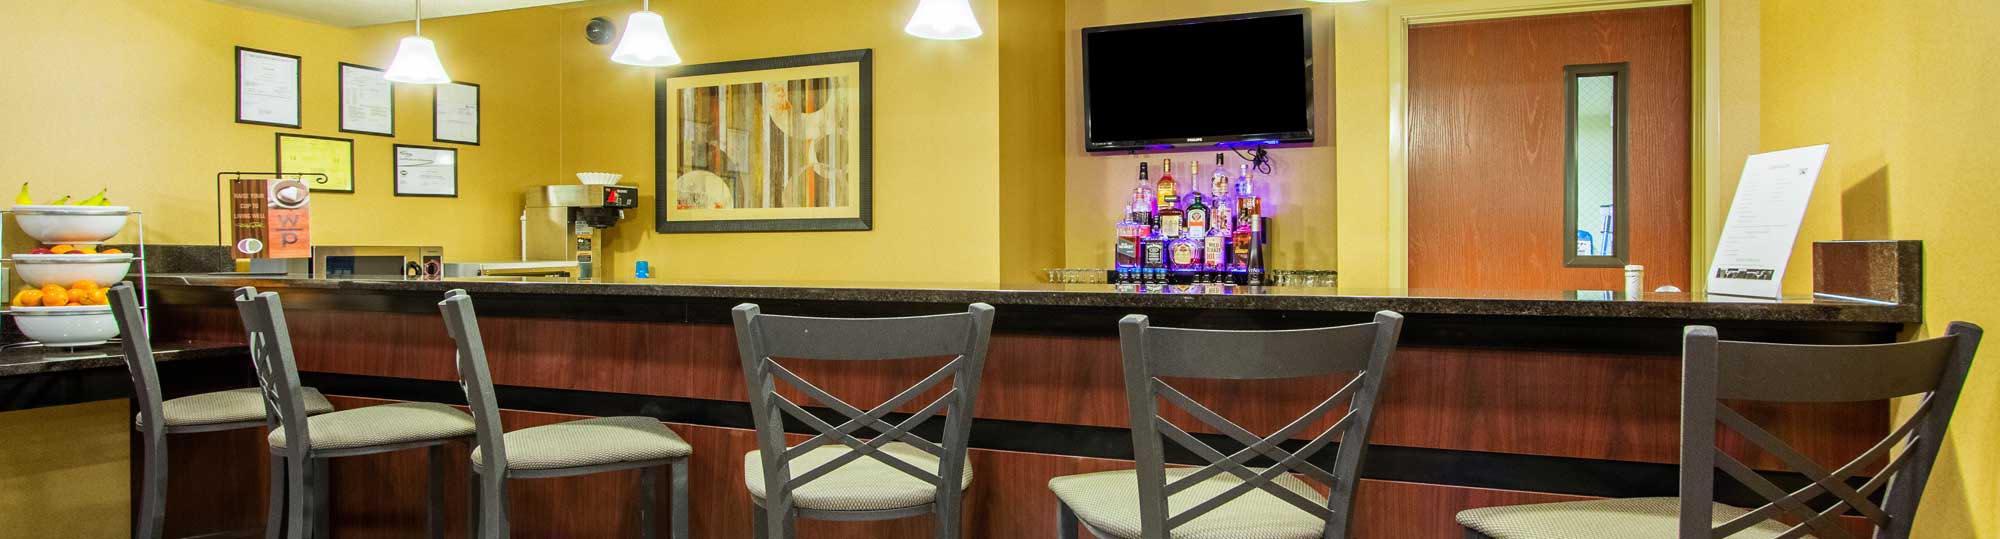 Cobblestone Inn & Suites Corry